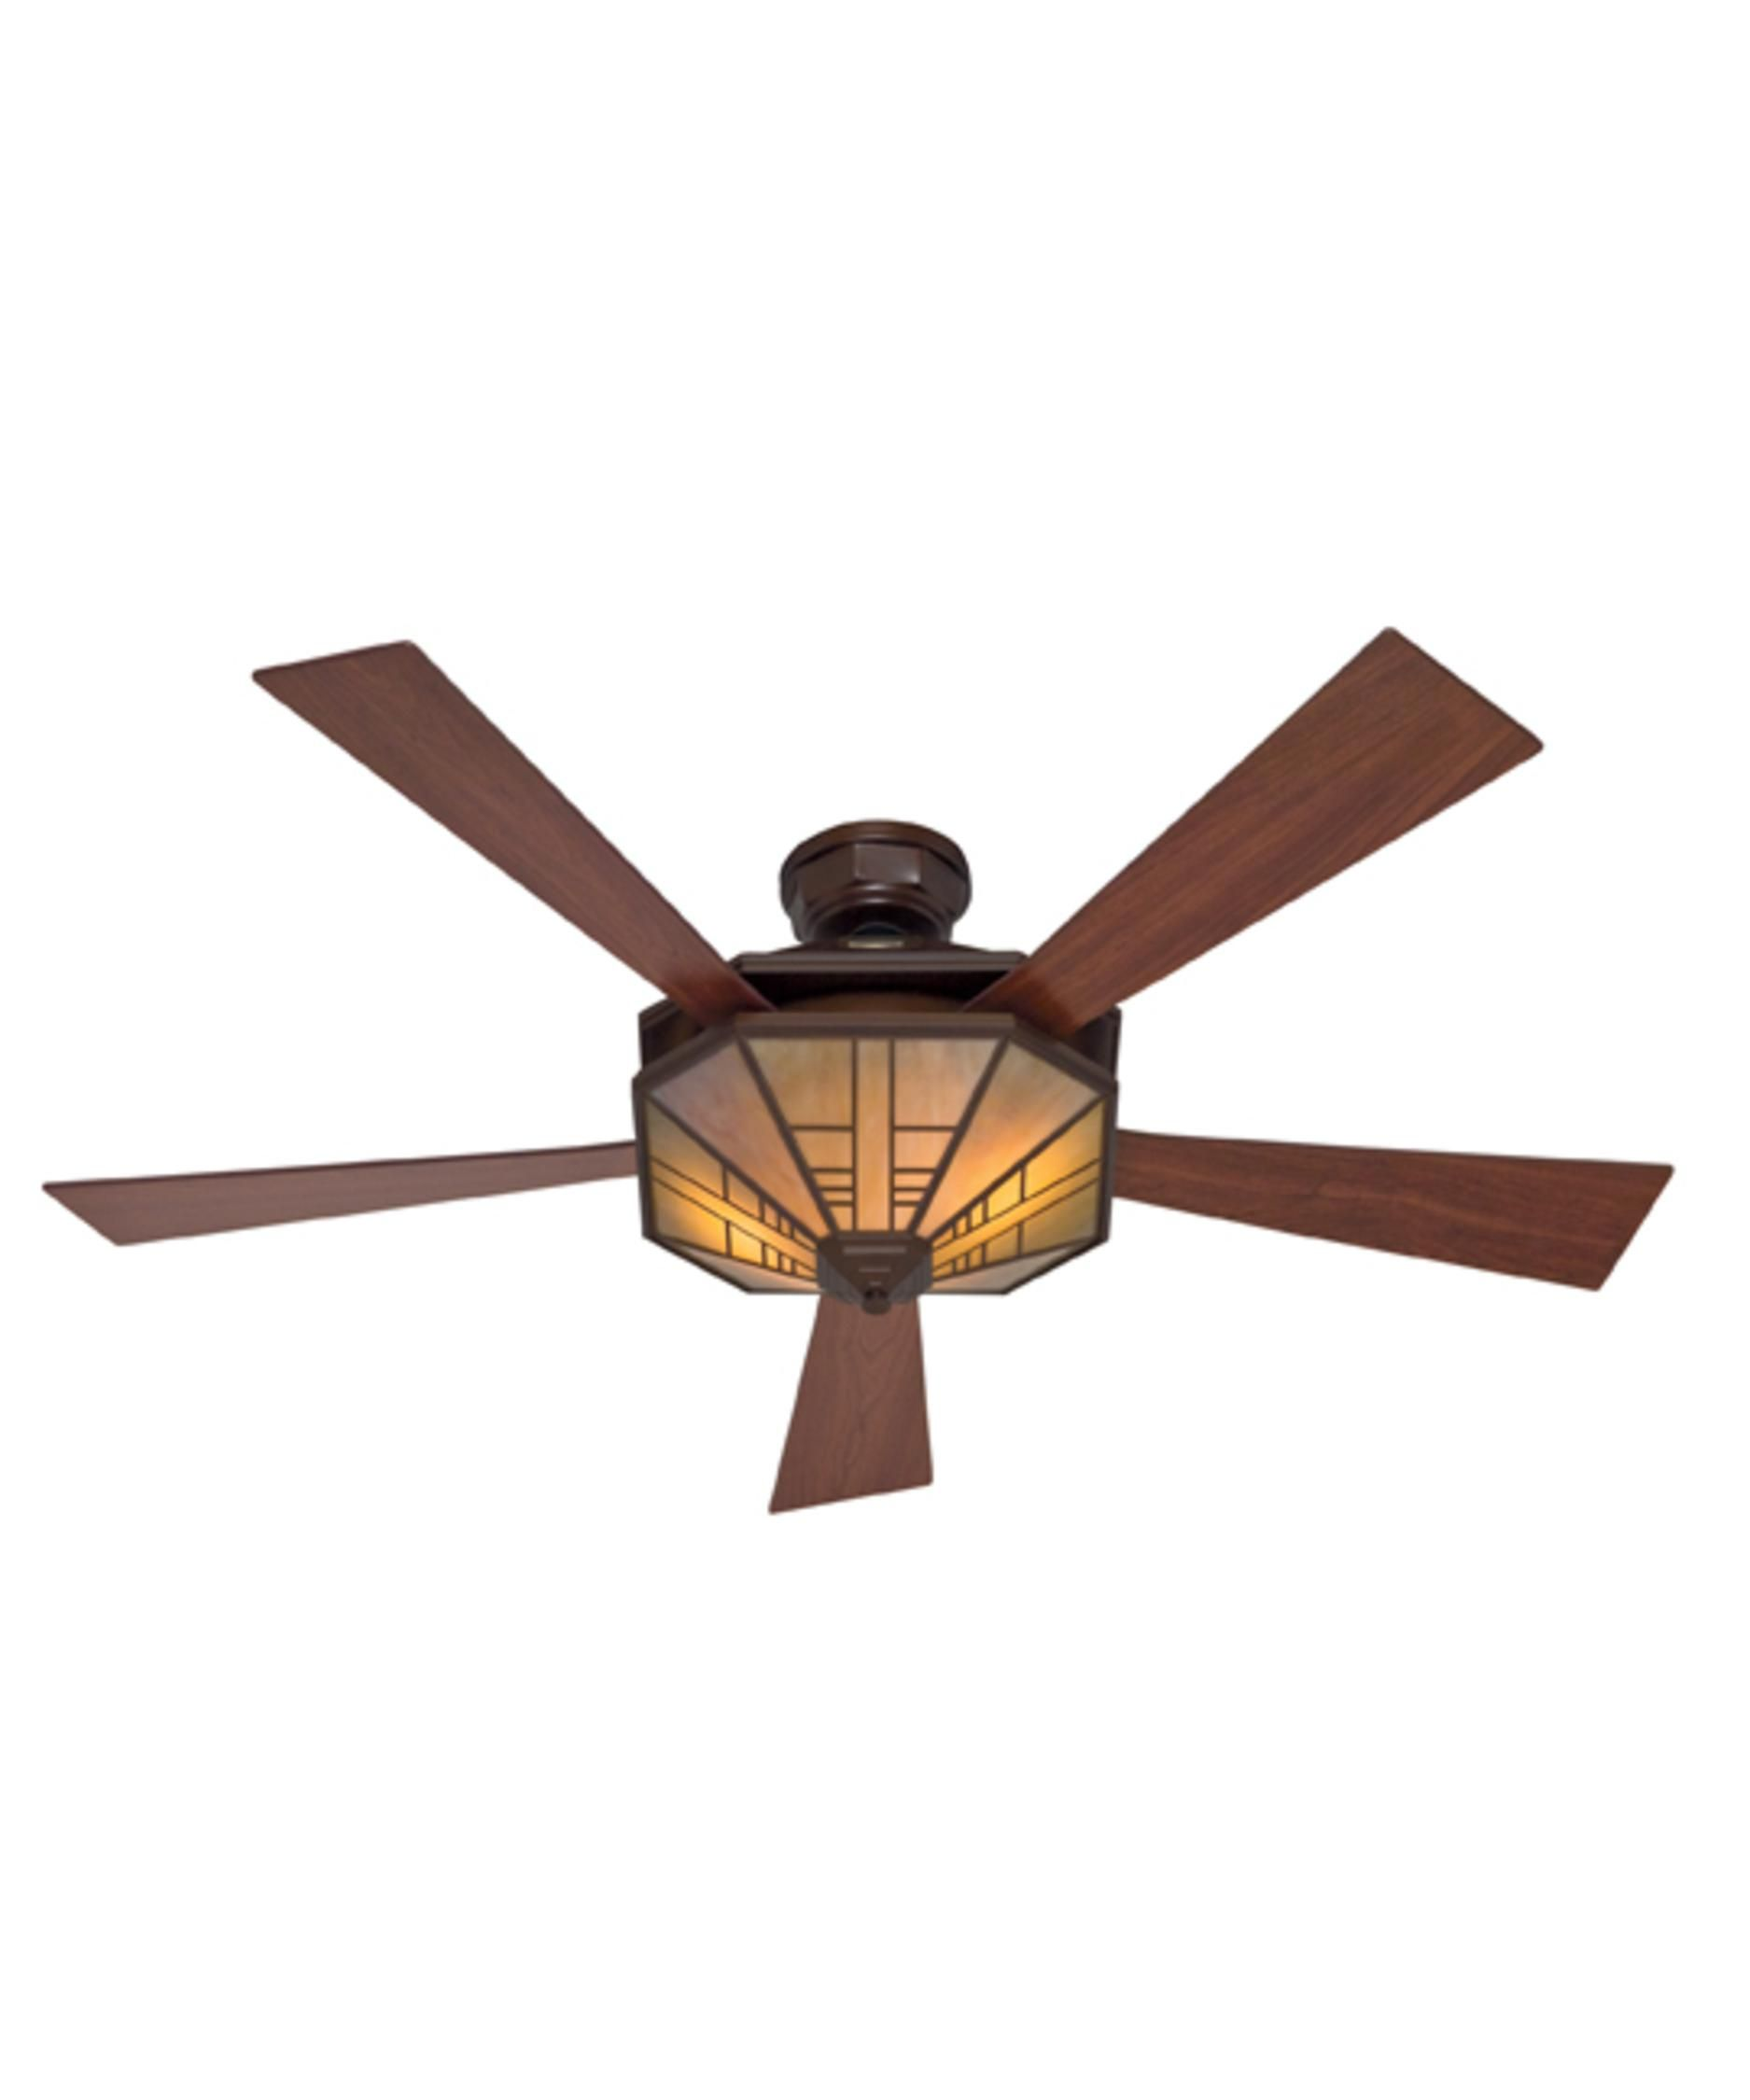 Hunter Fan 21978 1912 Mission 54 Inch Ceiling Fan With Light Kit Capitol Lighting 1 800lighting Com Craftsman Ceiling Fans Ceiling Fan Ceiling Fan With Light